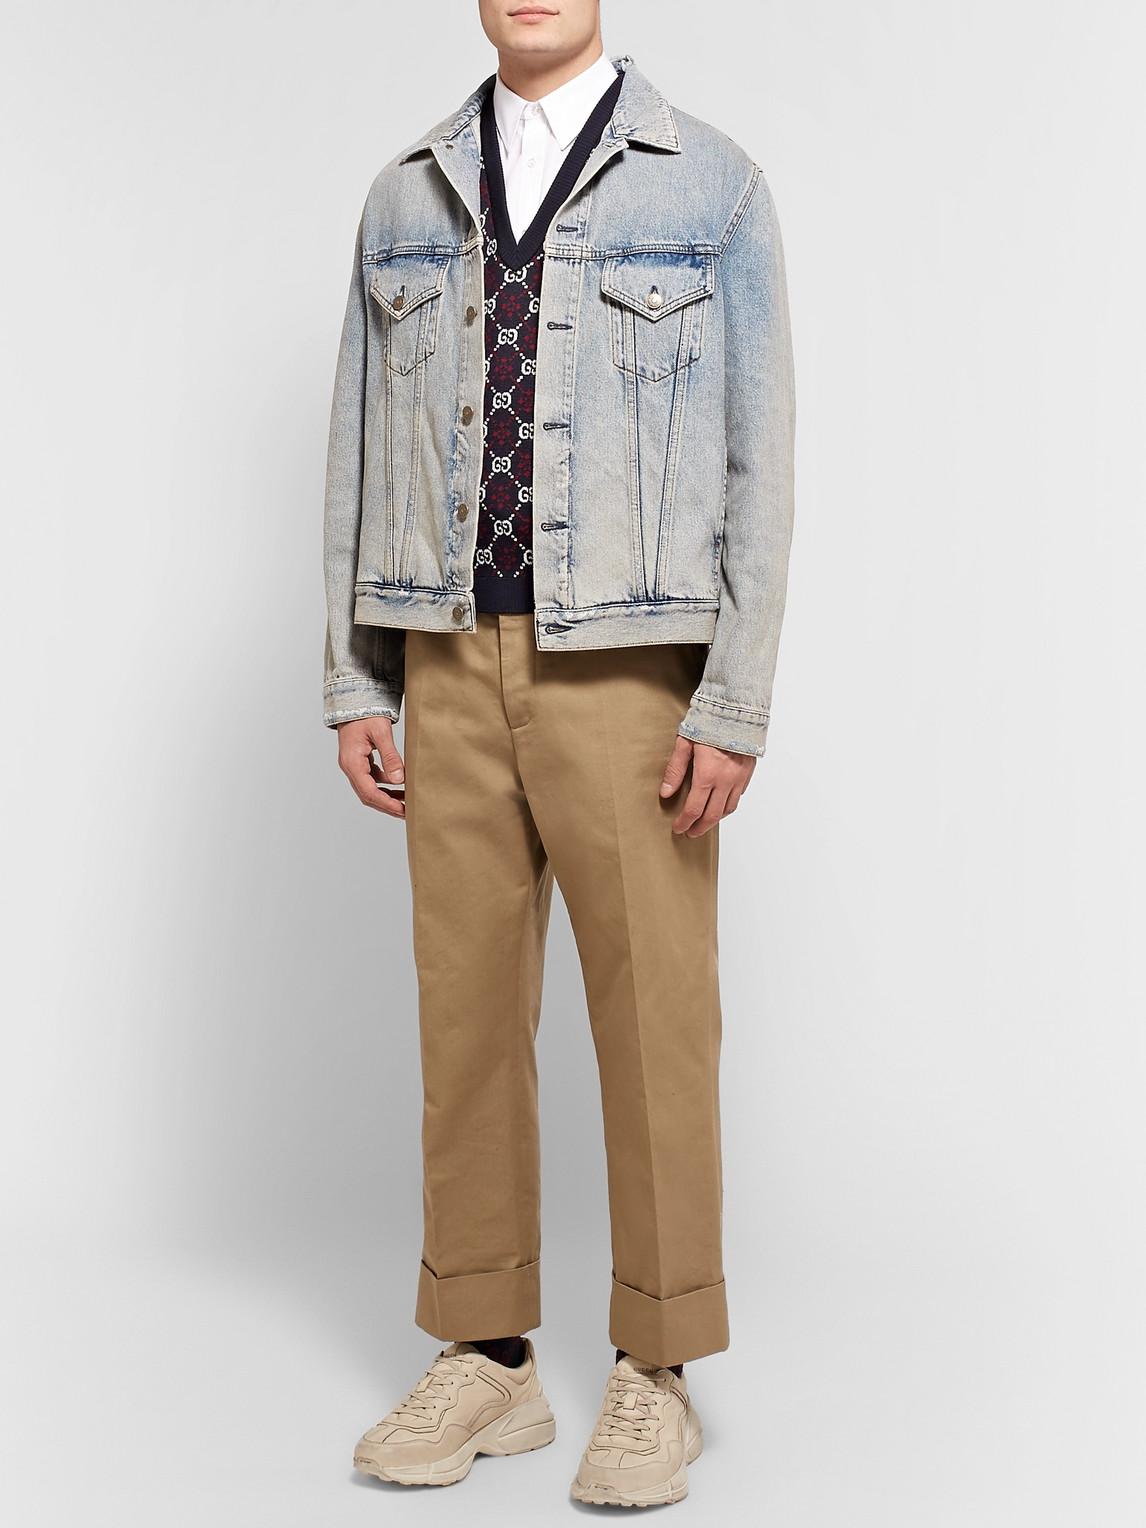 Gucci Sweaters SLIM-FIT LOGO-JACQUARD WOOL SWEATER VEST